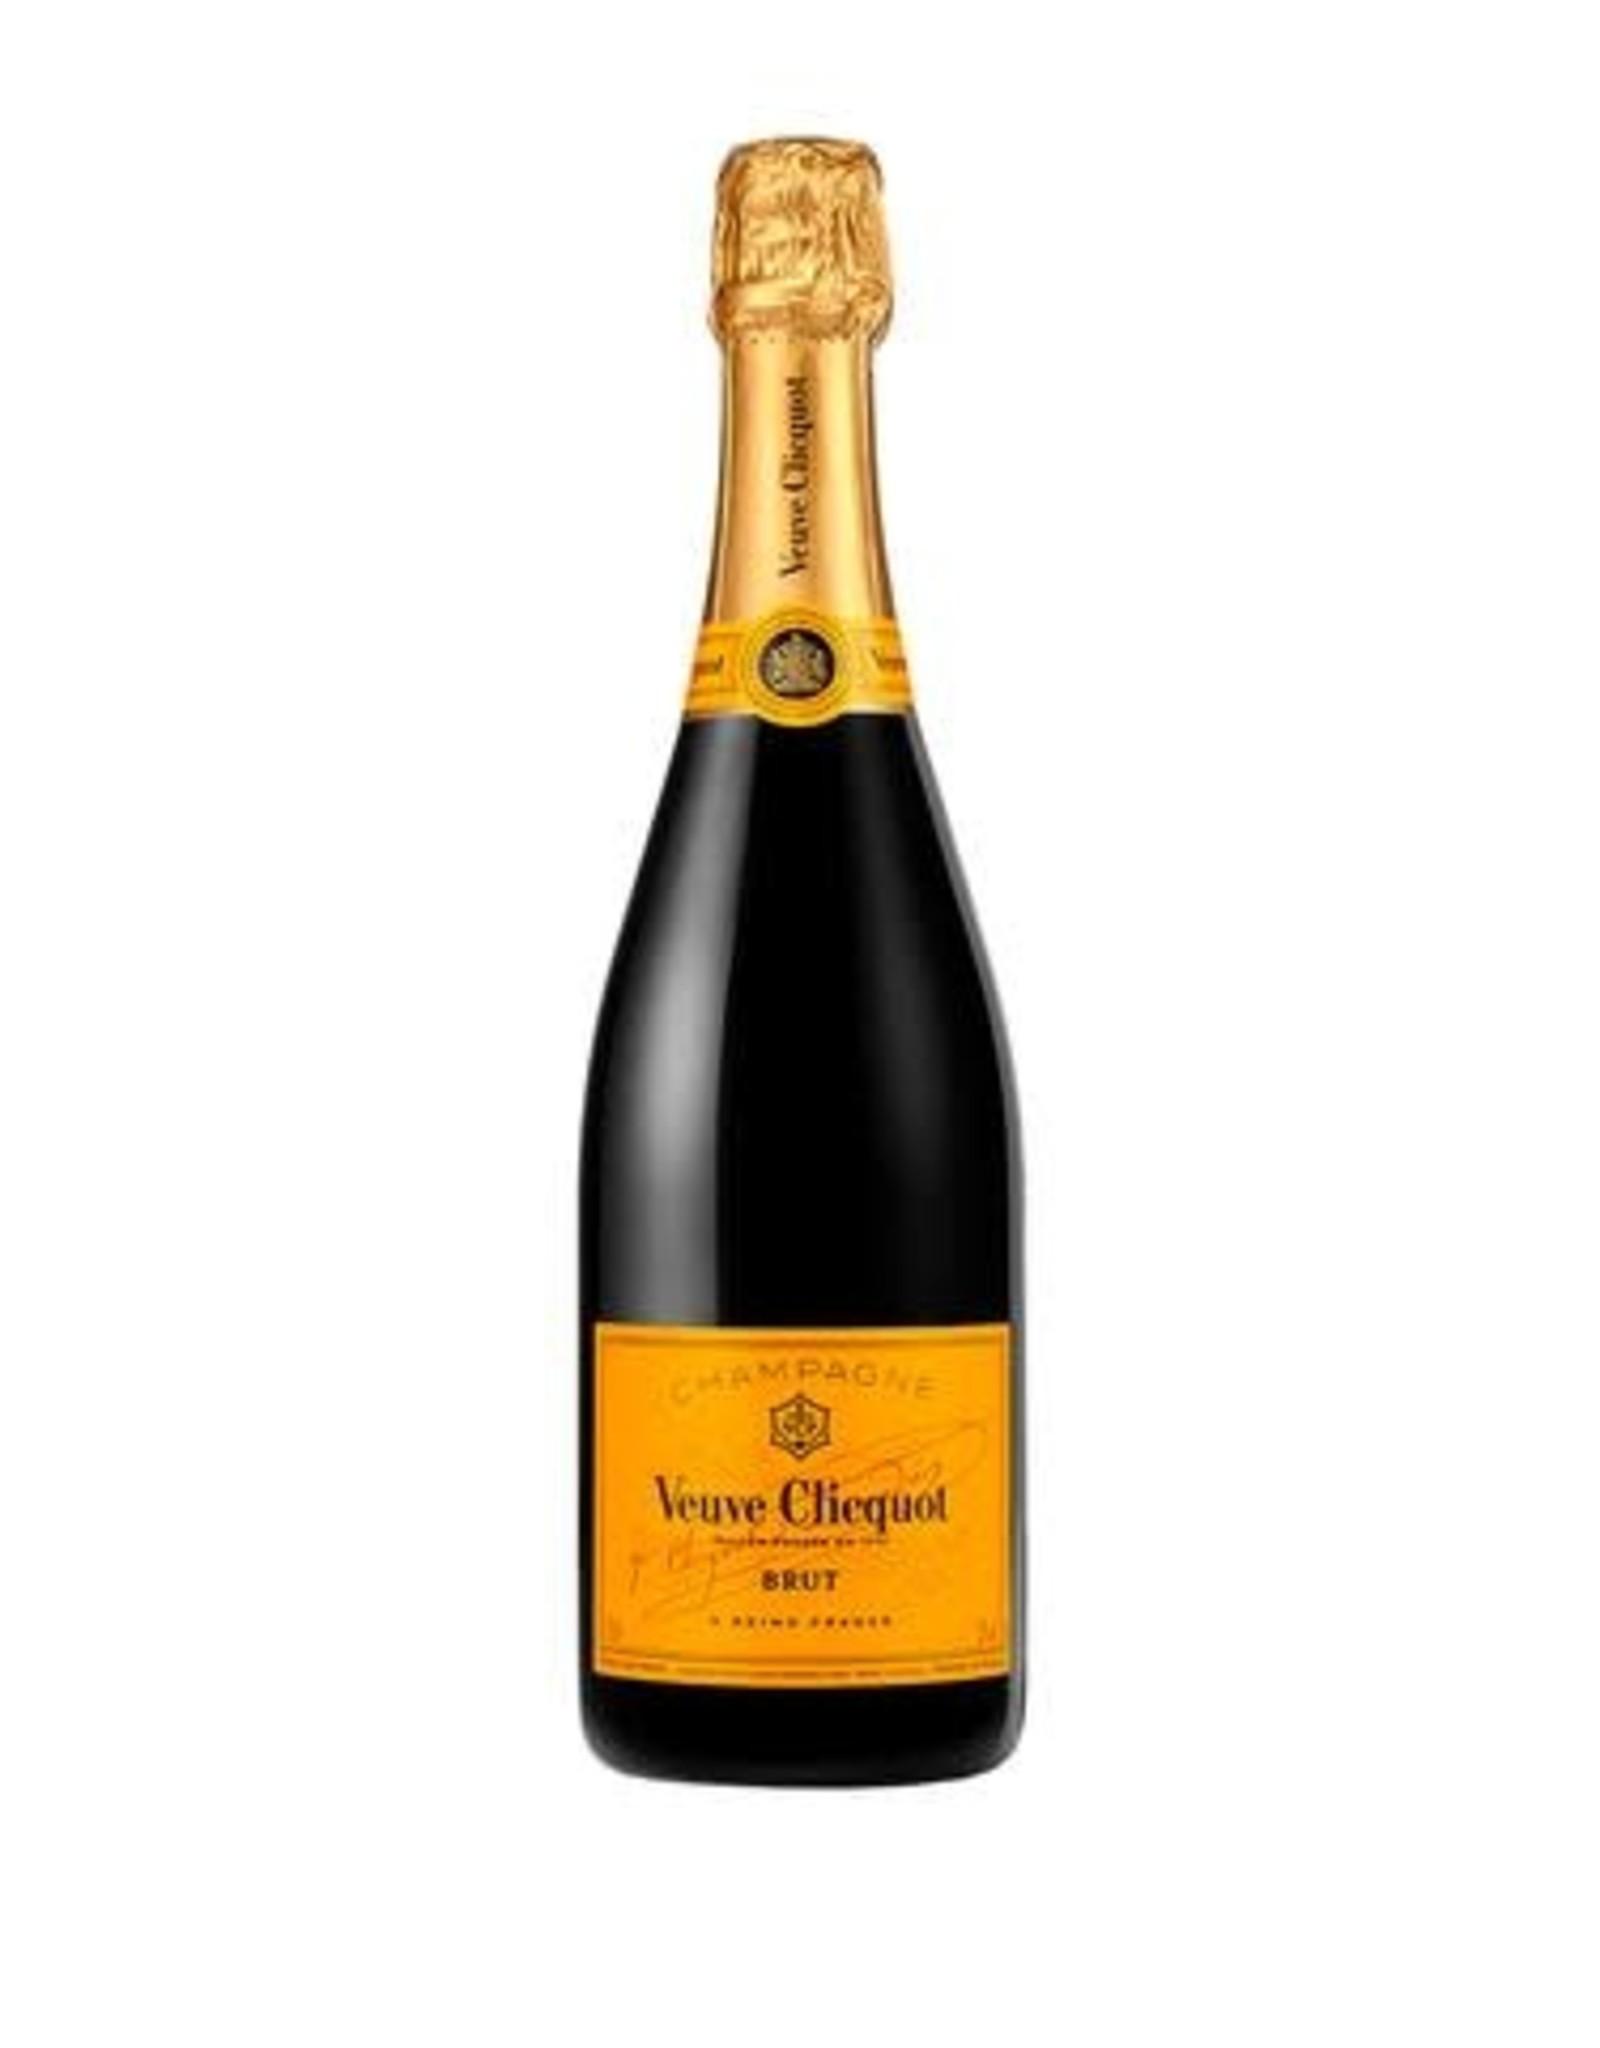 France Veuve Clicquot Yellow Label Brut 750ml